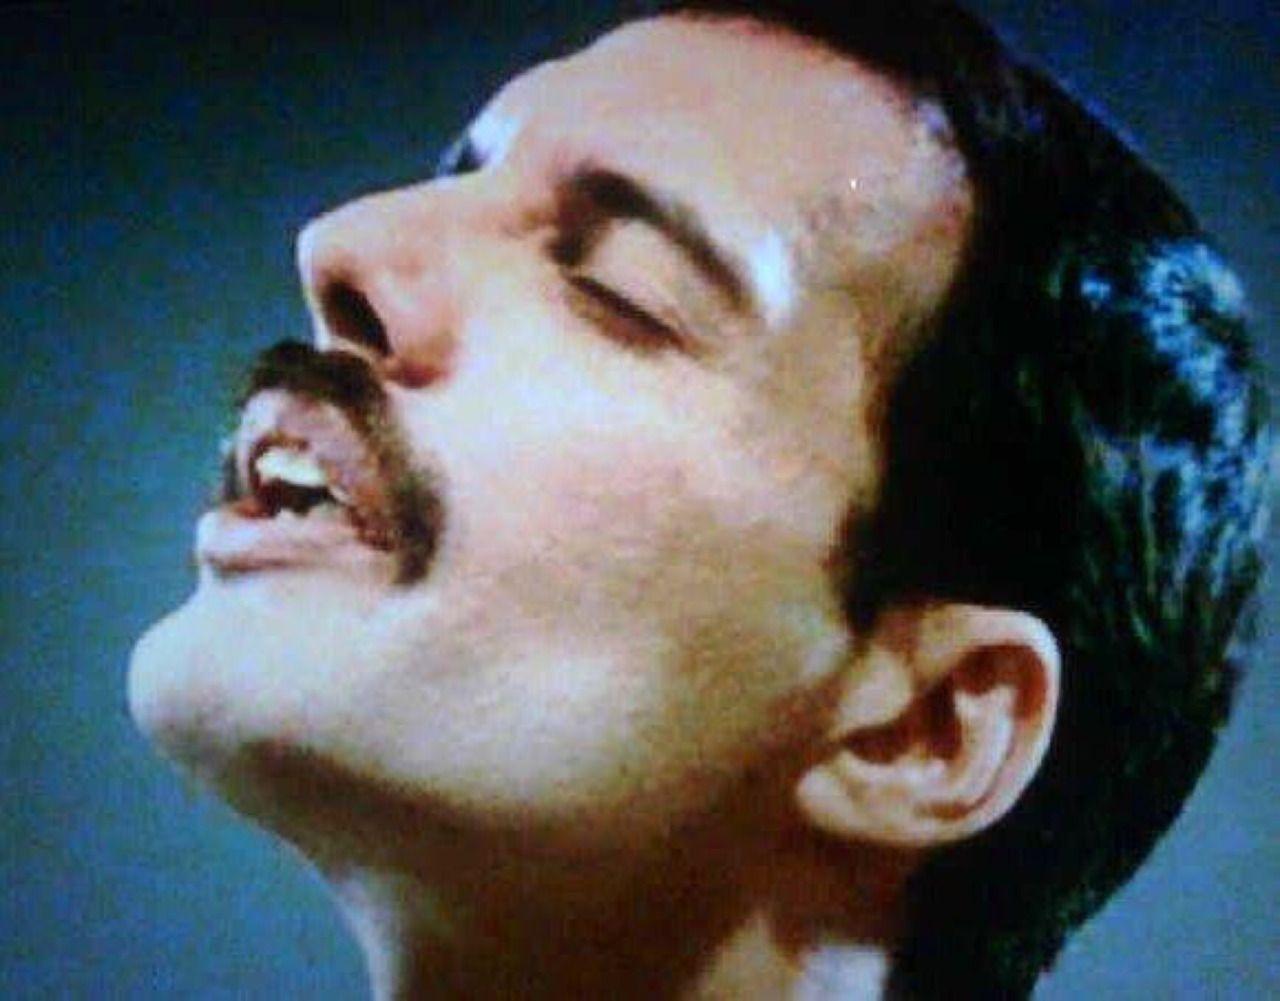 Mercury's Blog — Terrific Freddie Friday pics for terrific people...